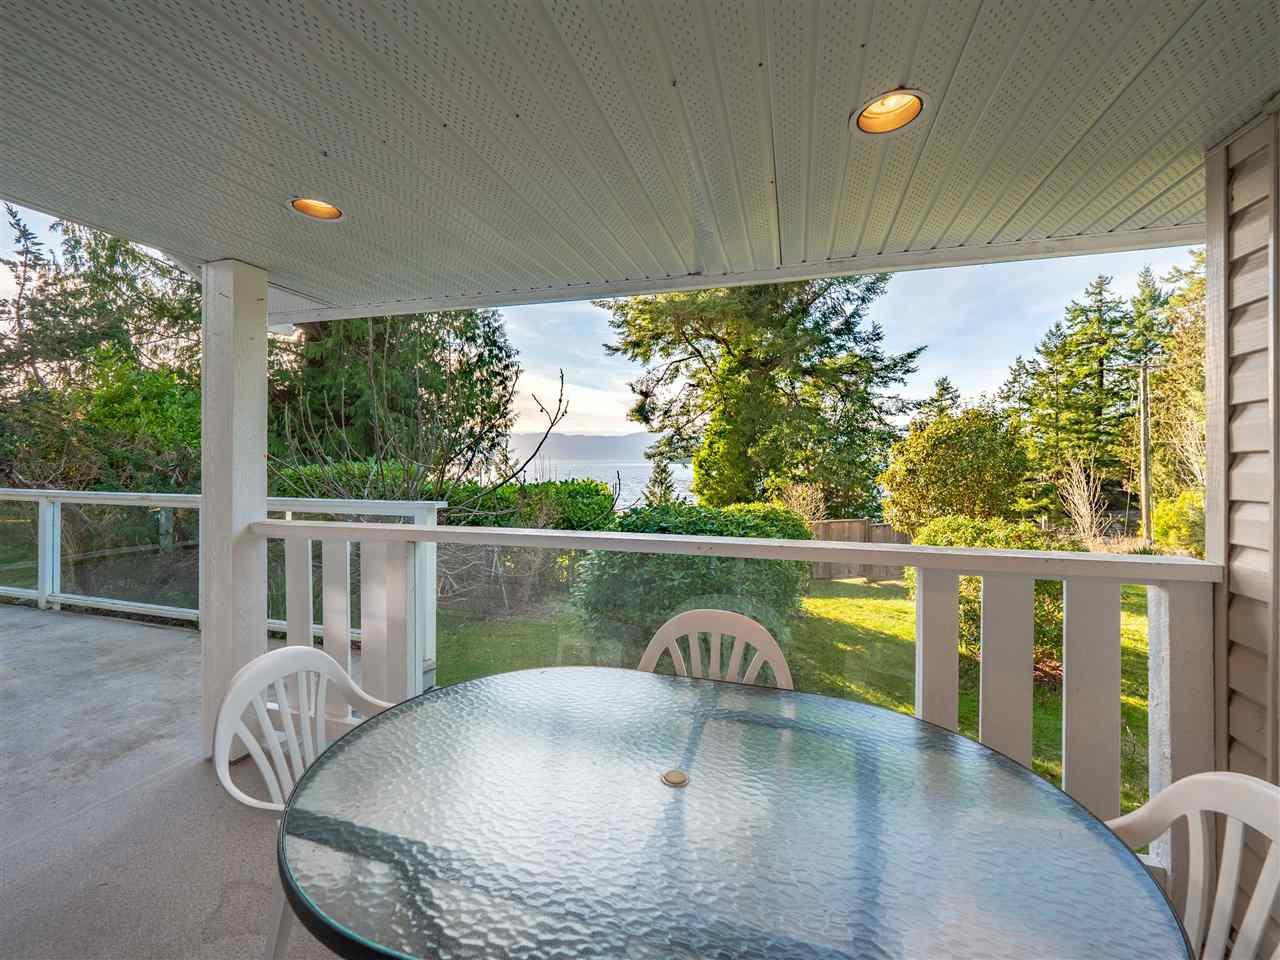 Main Photo: 4175 IRVINES LANDING Road in Garden Bay: Pender Harbour Egmont House for sale (Sunshine Coast)  : MLS®# R2339646